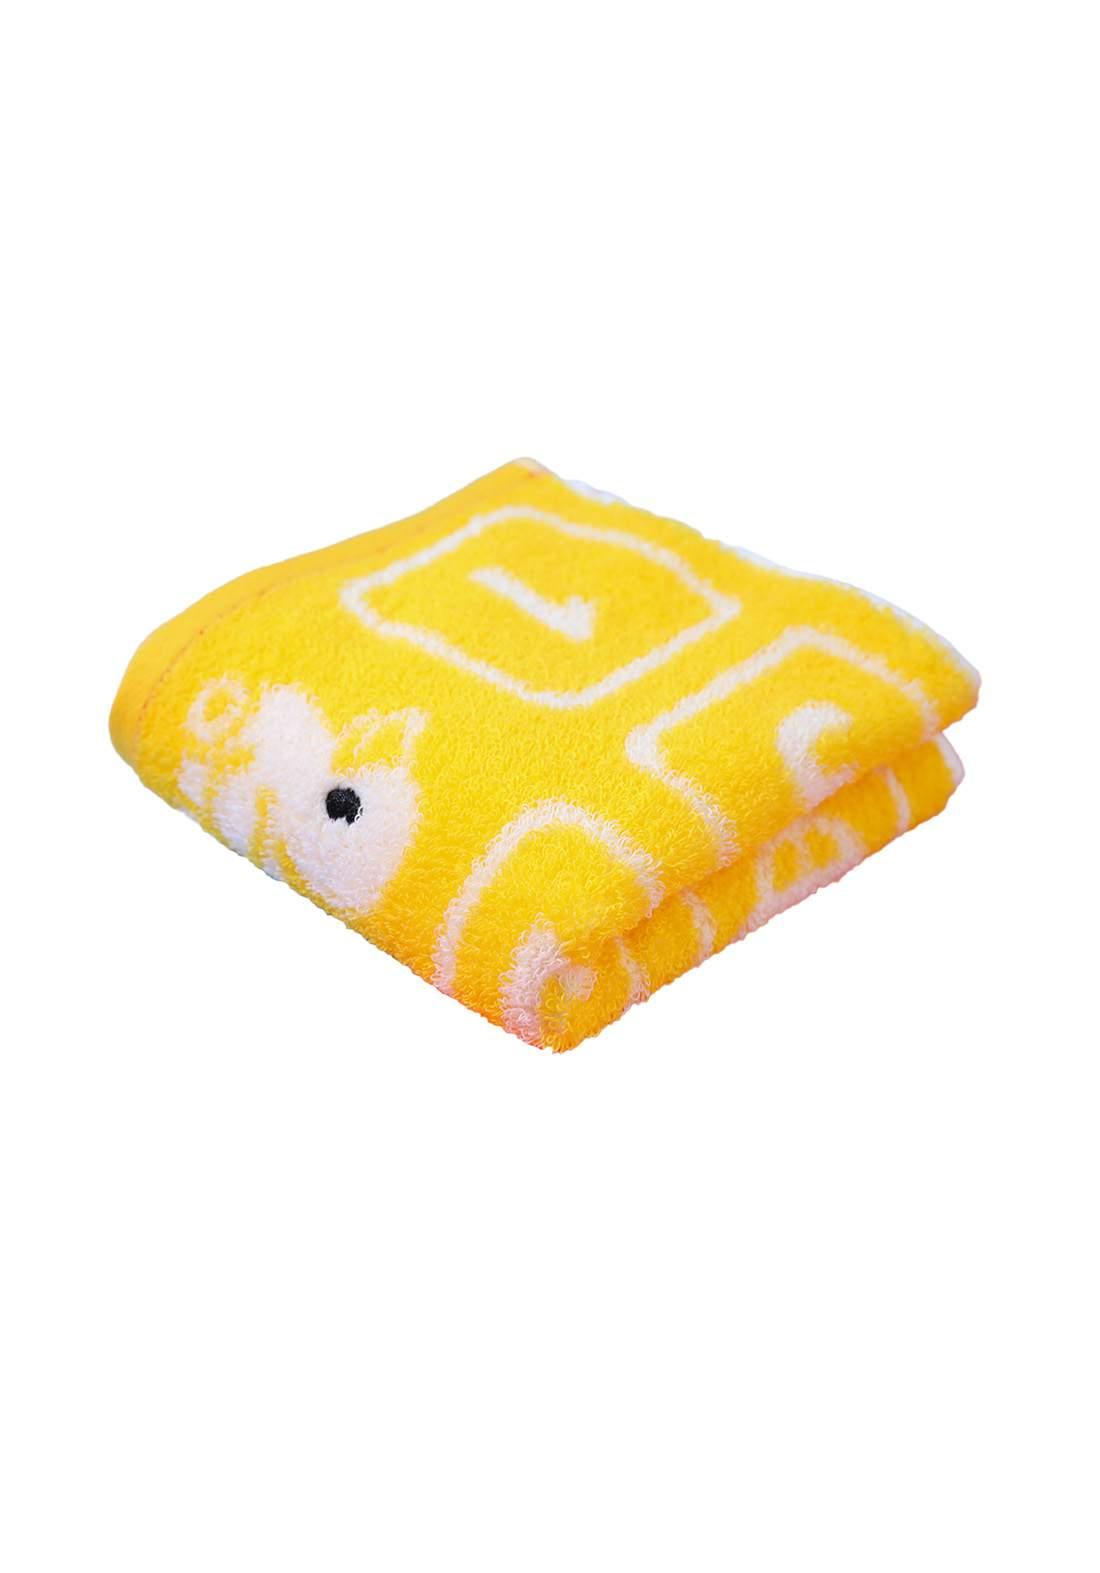 منشفة صفراء من Ilahui